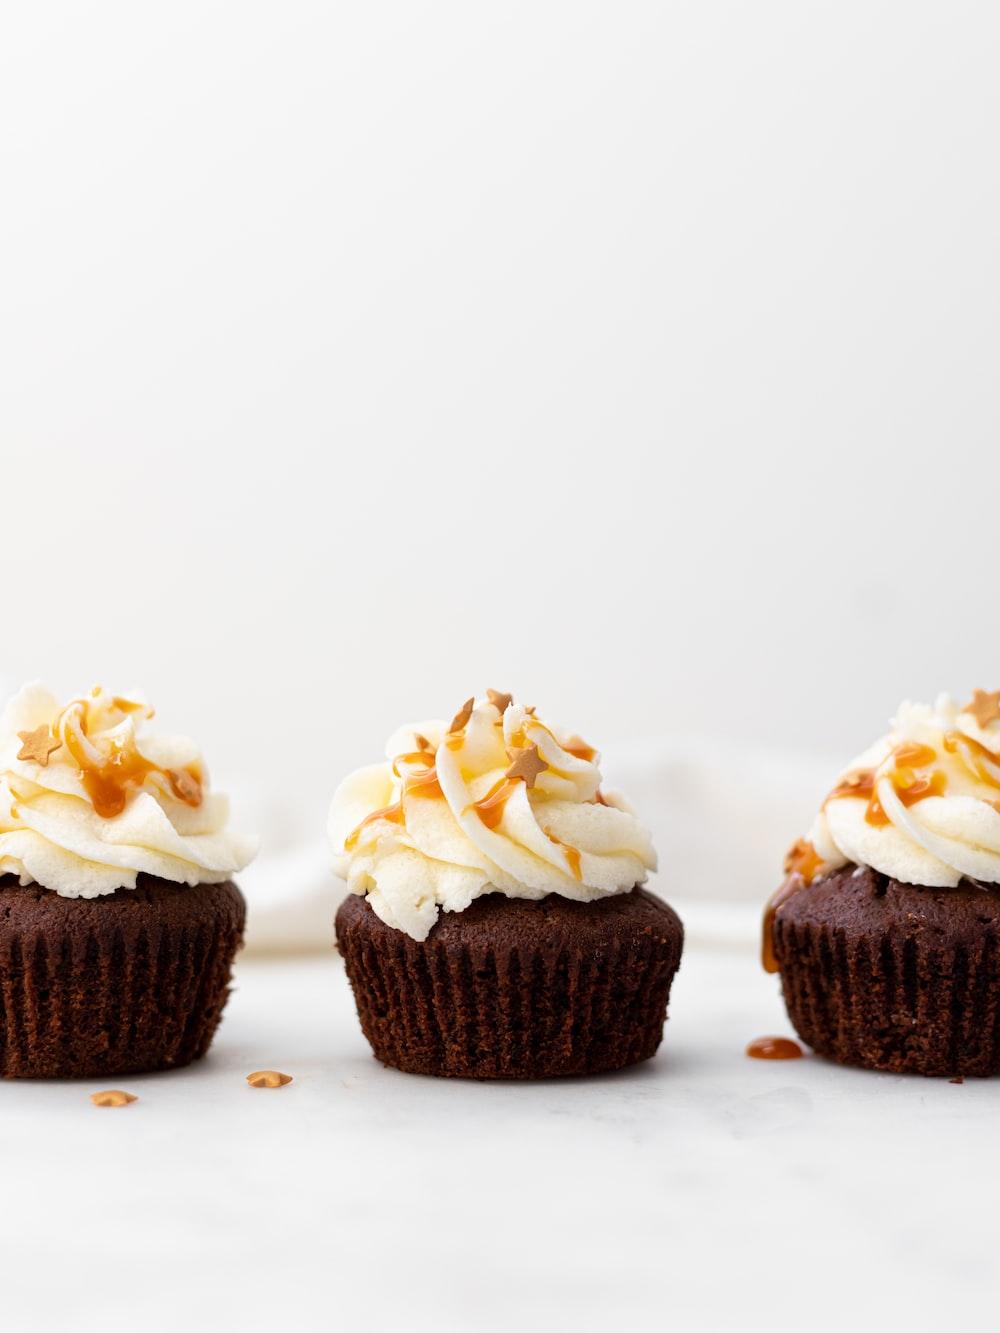 three cupcakes on white surface